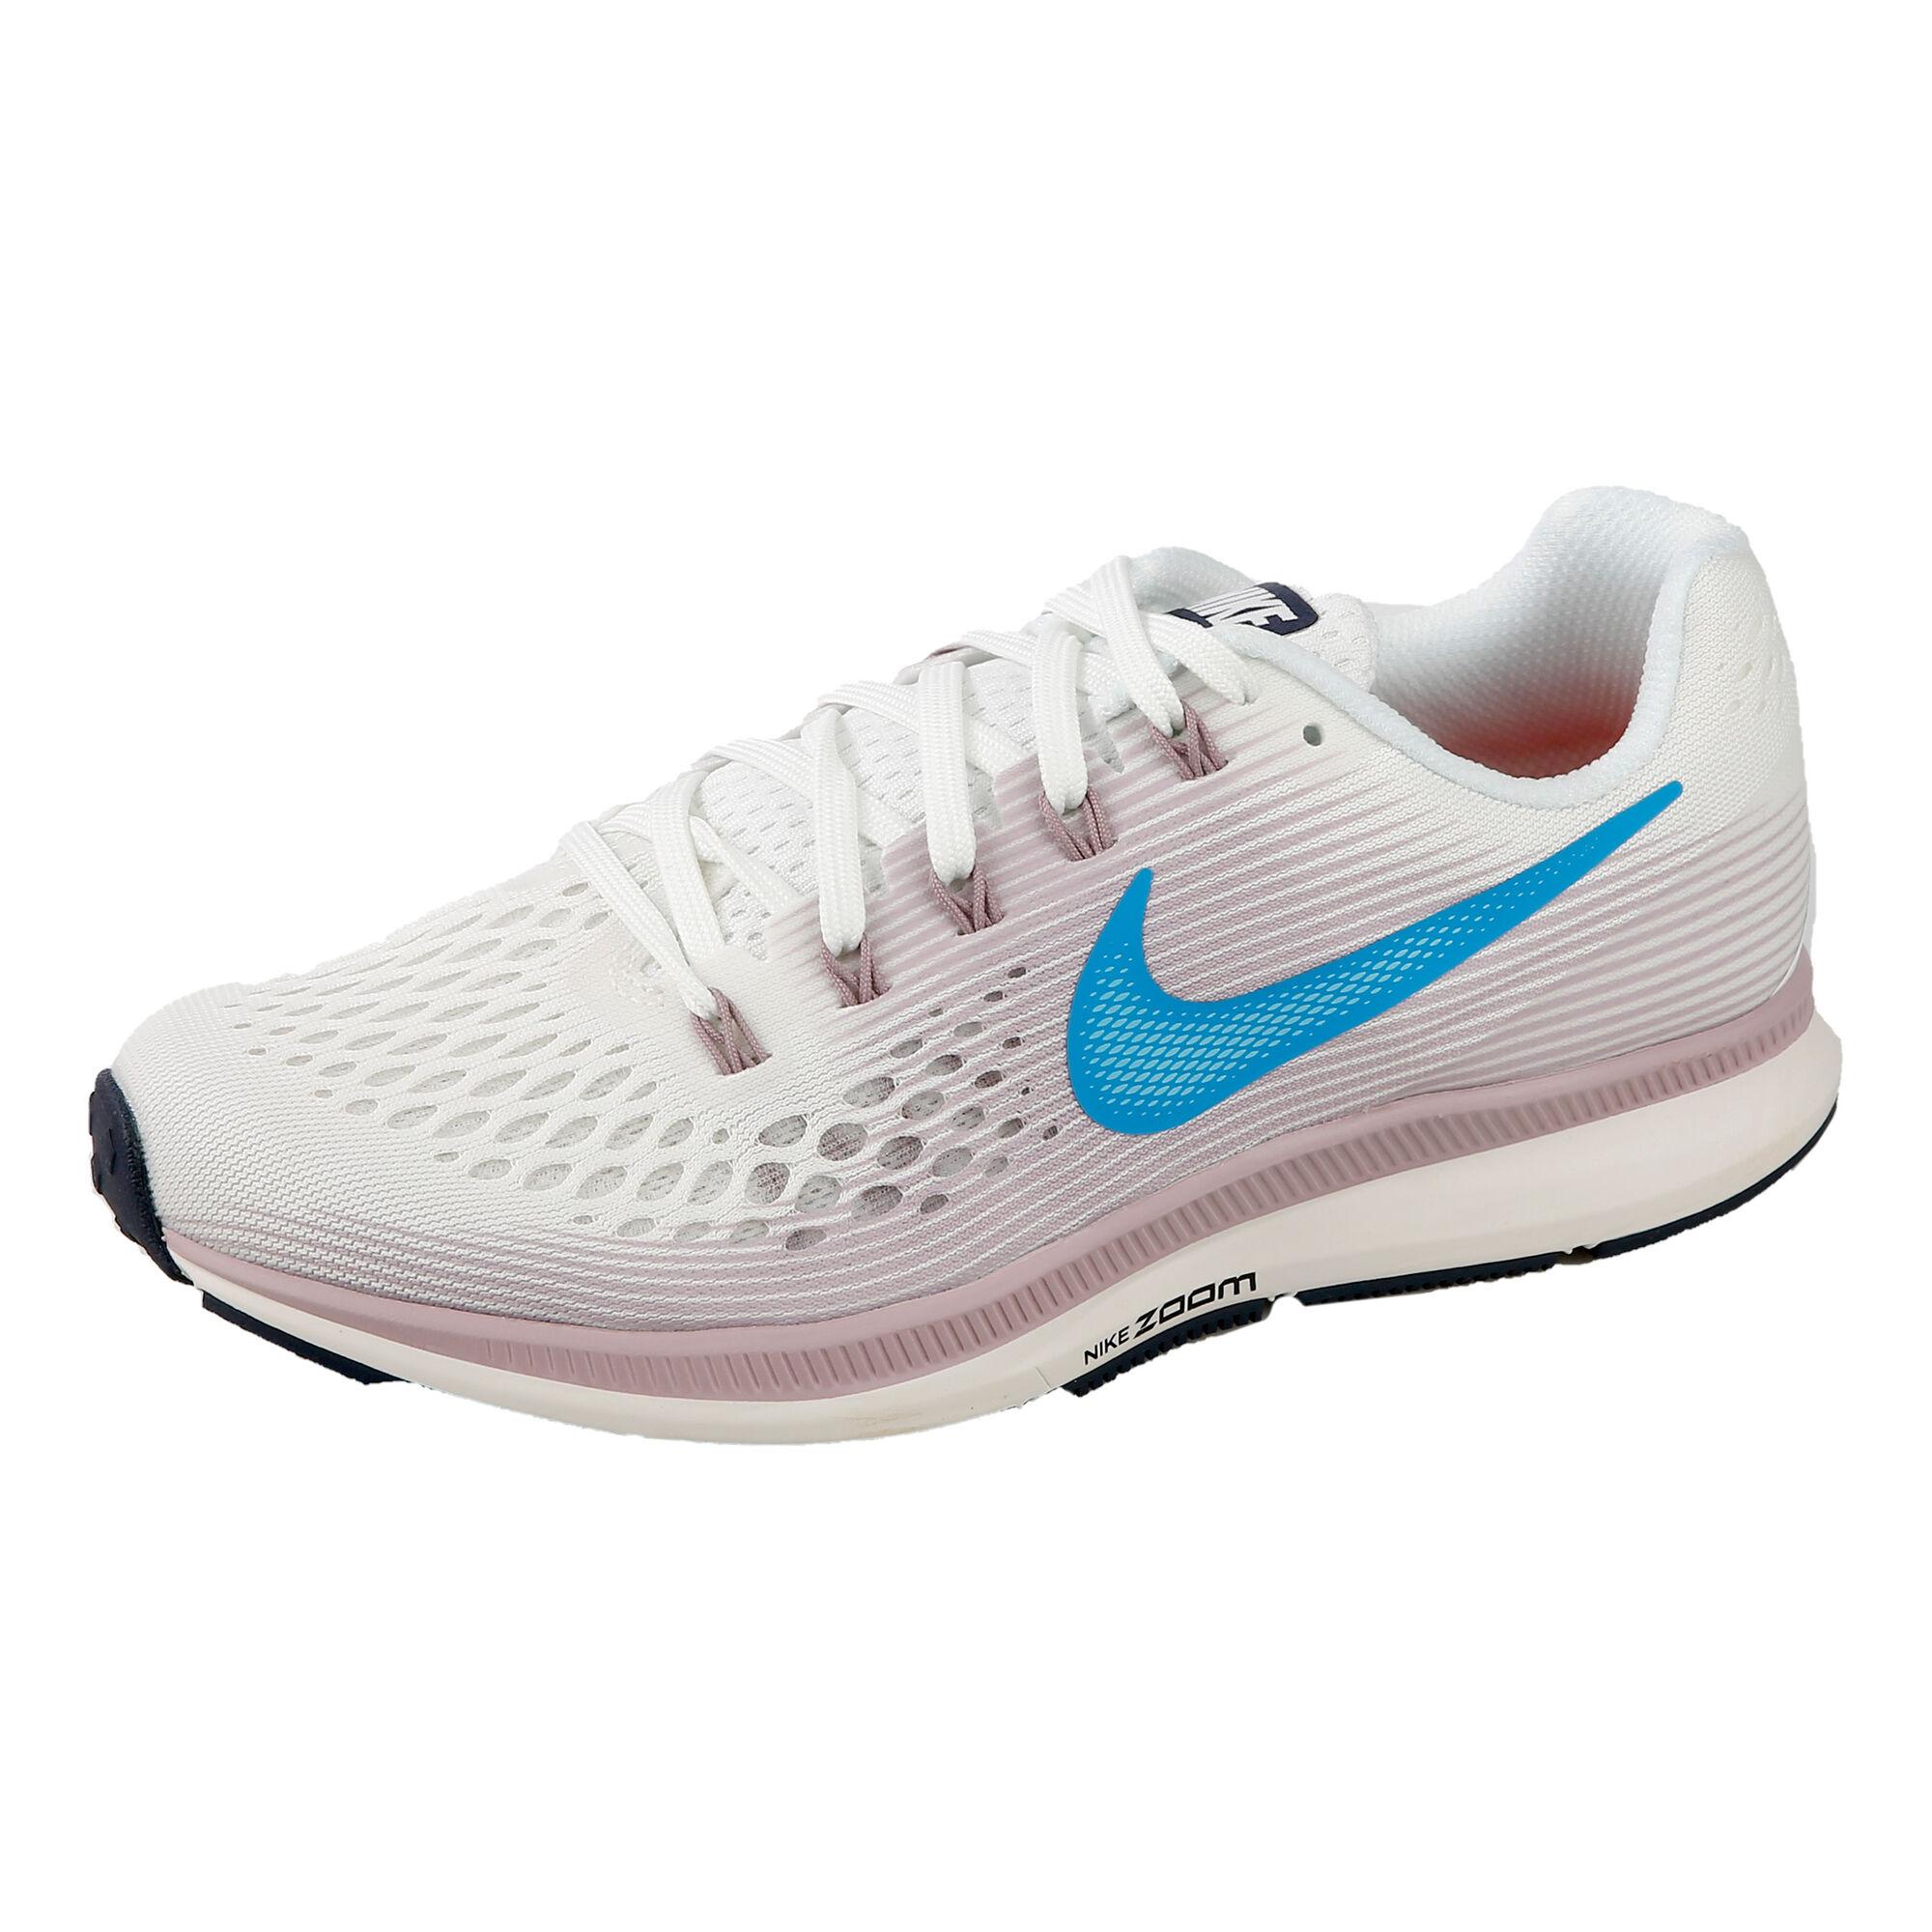 promo code 9d8d8 17916 Nike Air Zoom Pegasus 34 Neutral Running Shoe Women - White, Light Blue